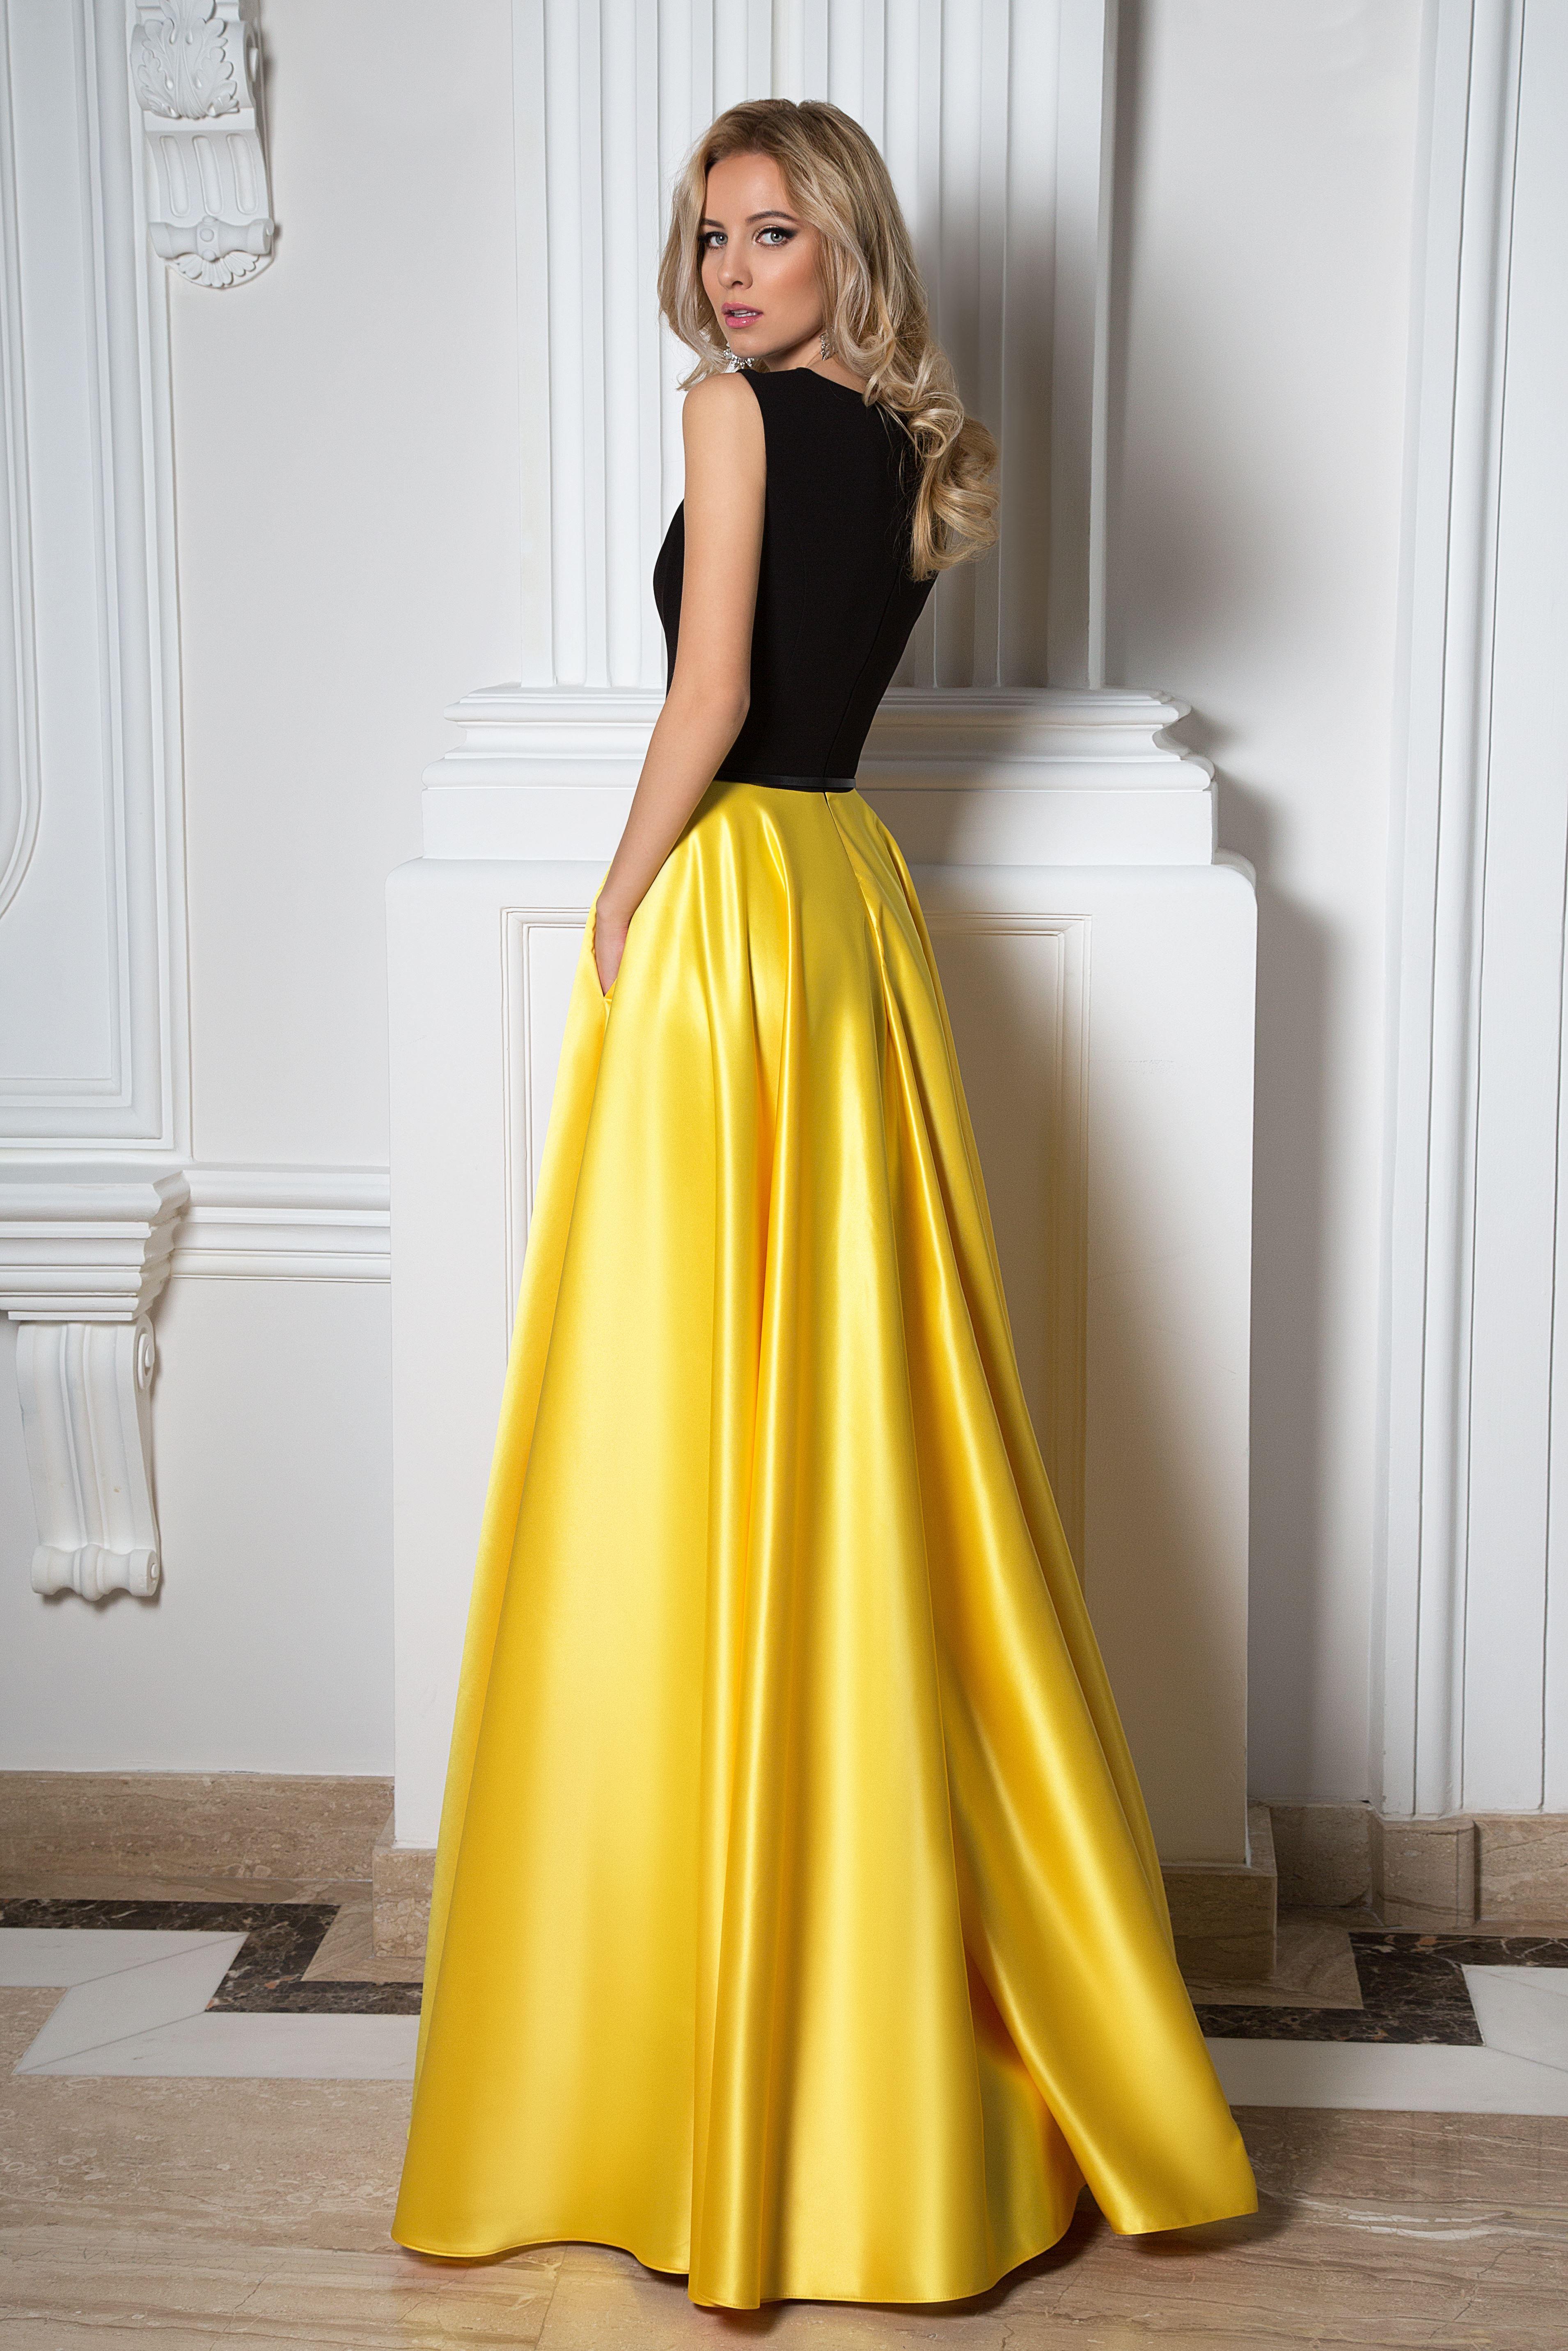 Pin by oksana mukha ltd on evening dresses aw pinterest